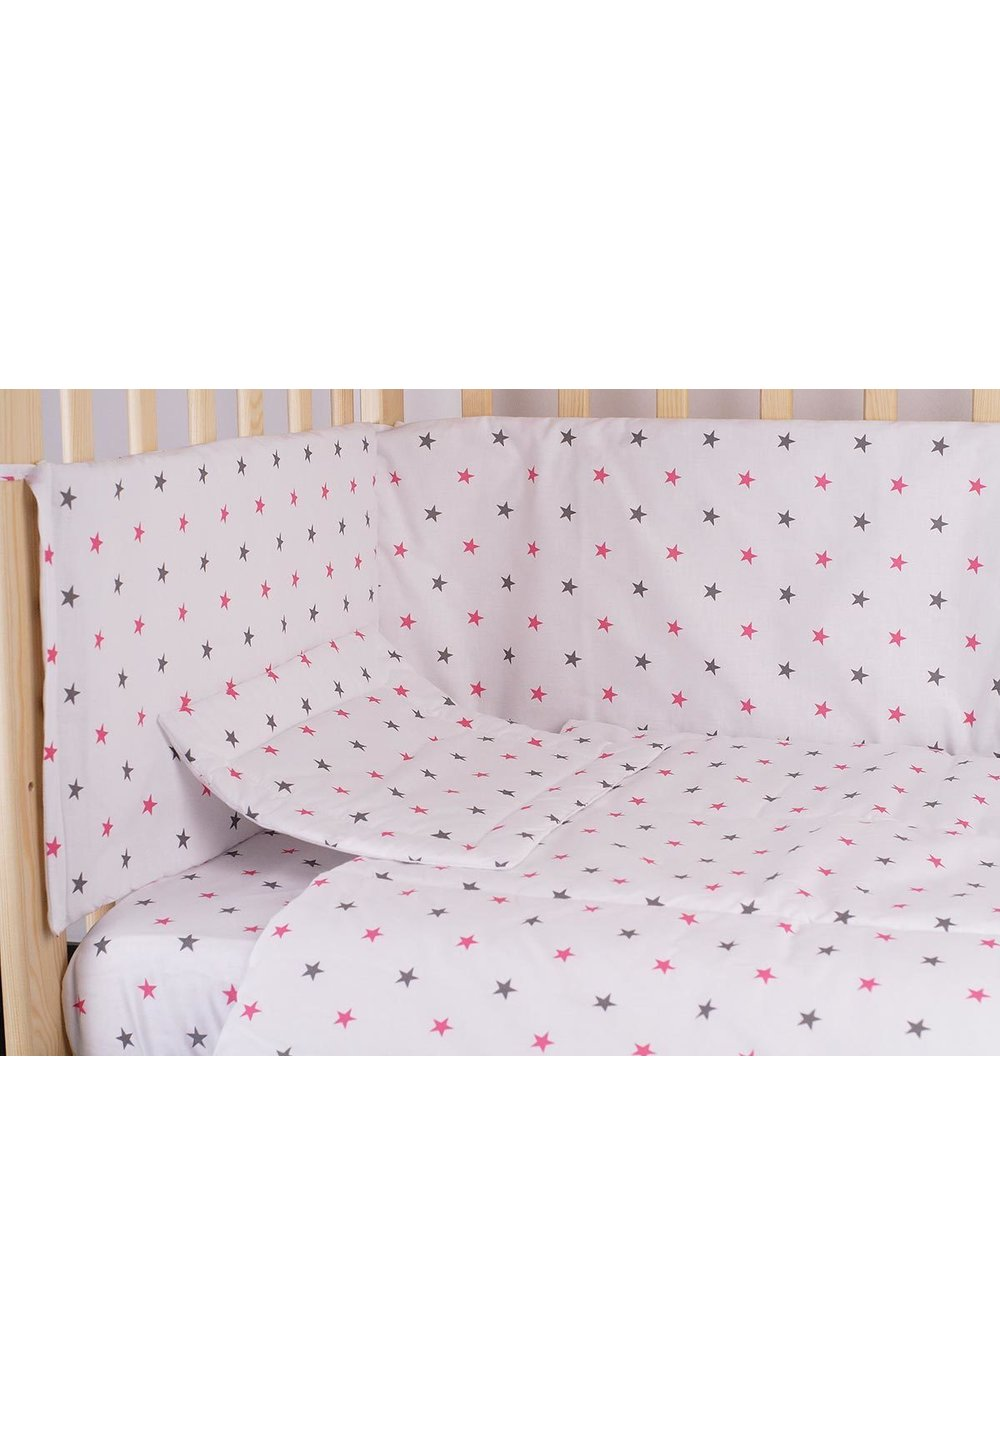 Lenjerie alba,stelute roz cu gri,4 piese, 120 x 60 imagine